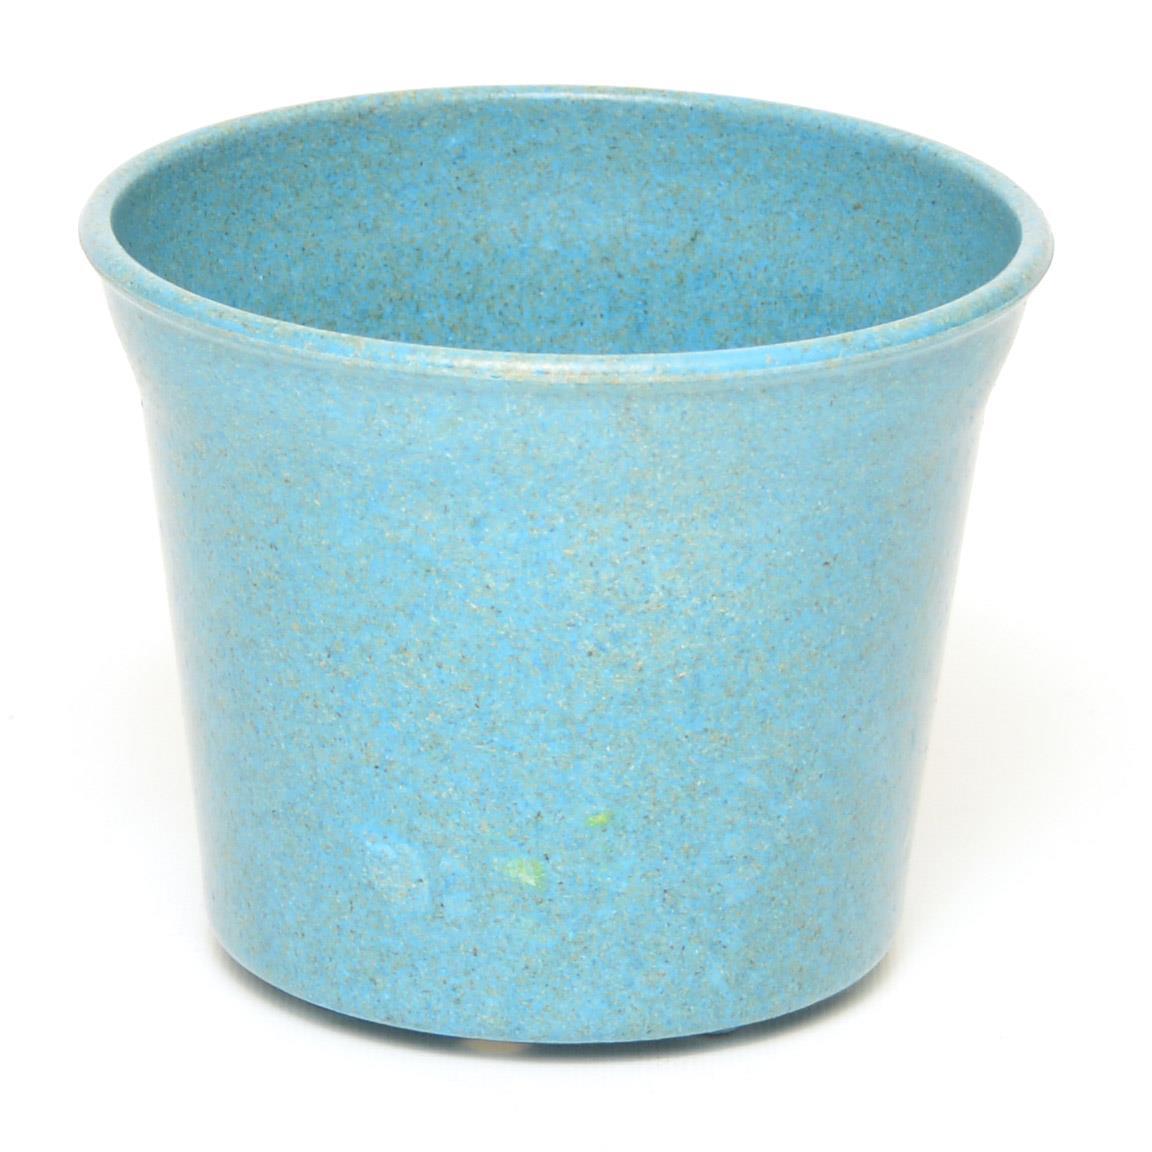 3x3 Flared Cylinder - Ocean Blue